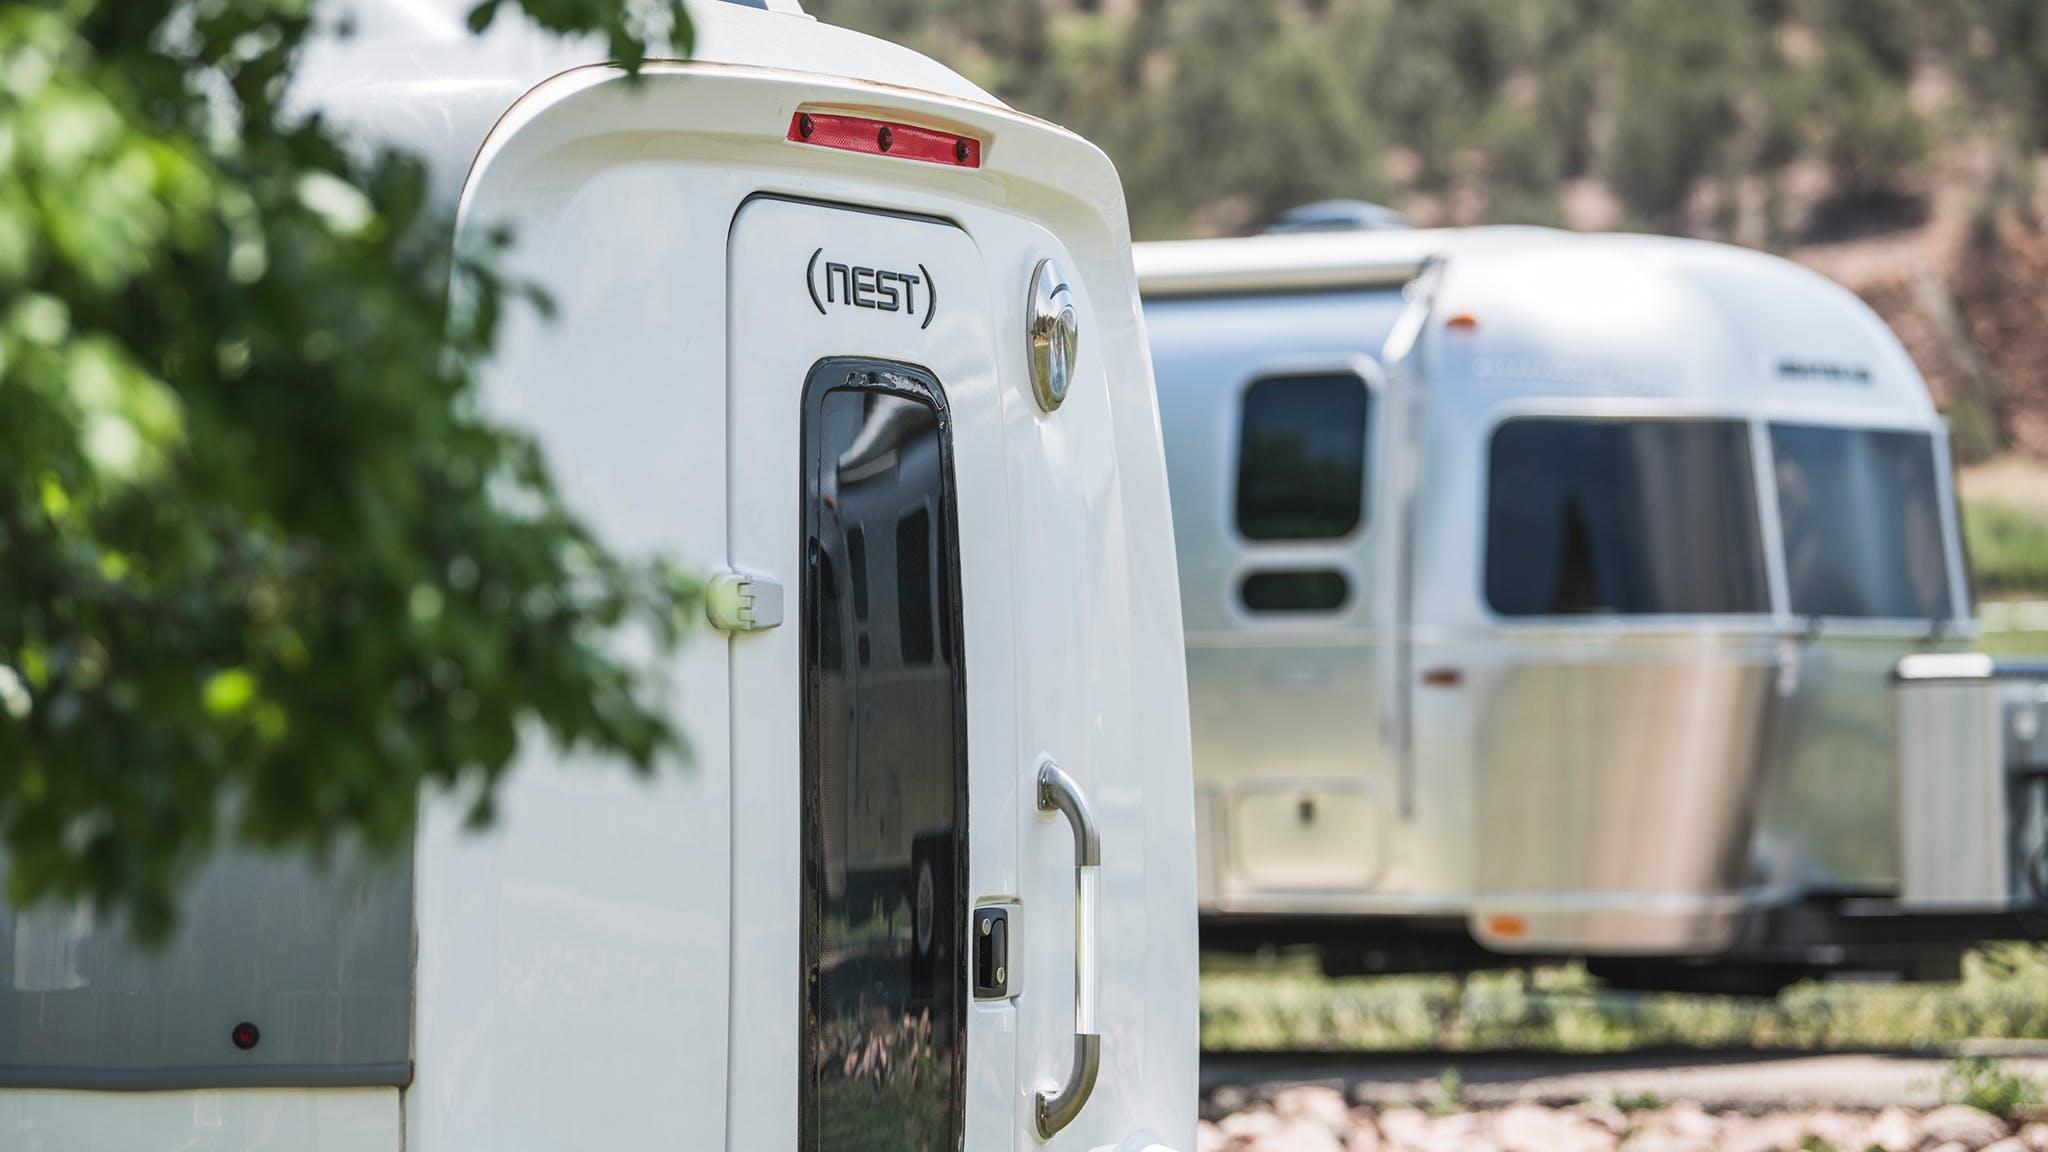 Airstream Nest and Travel Trailer